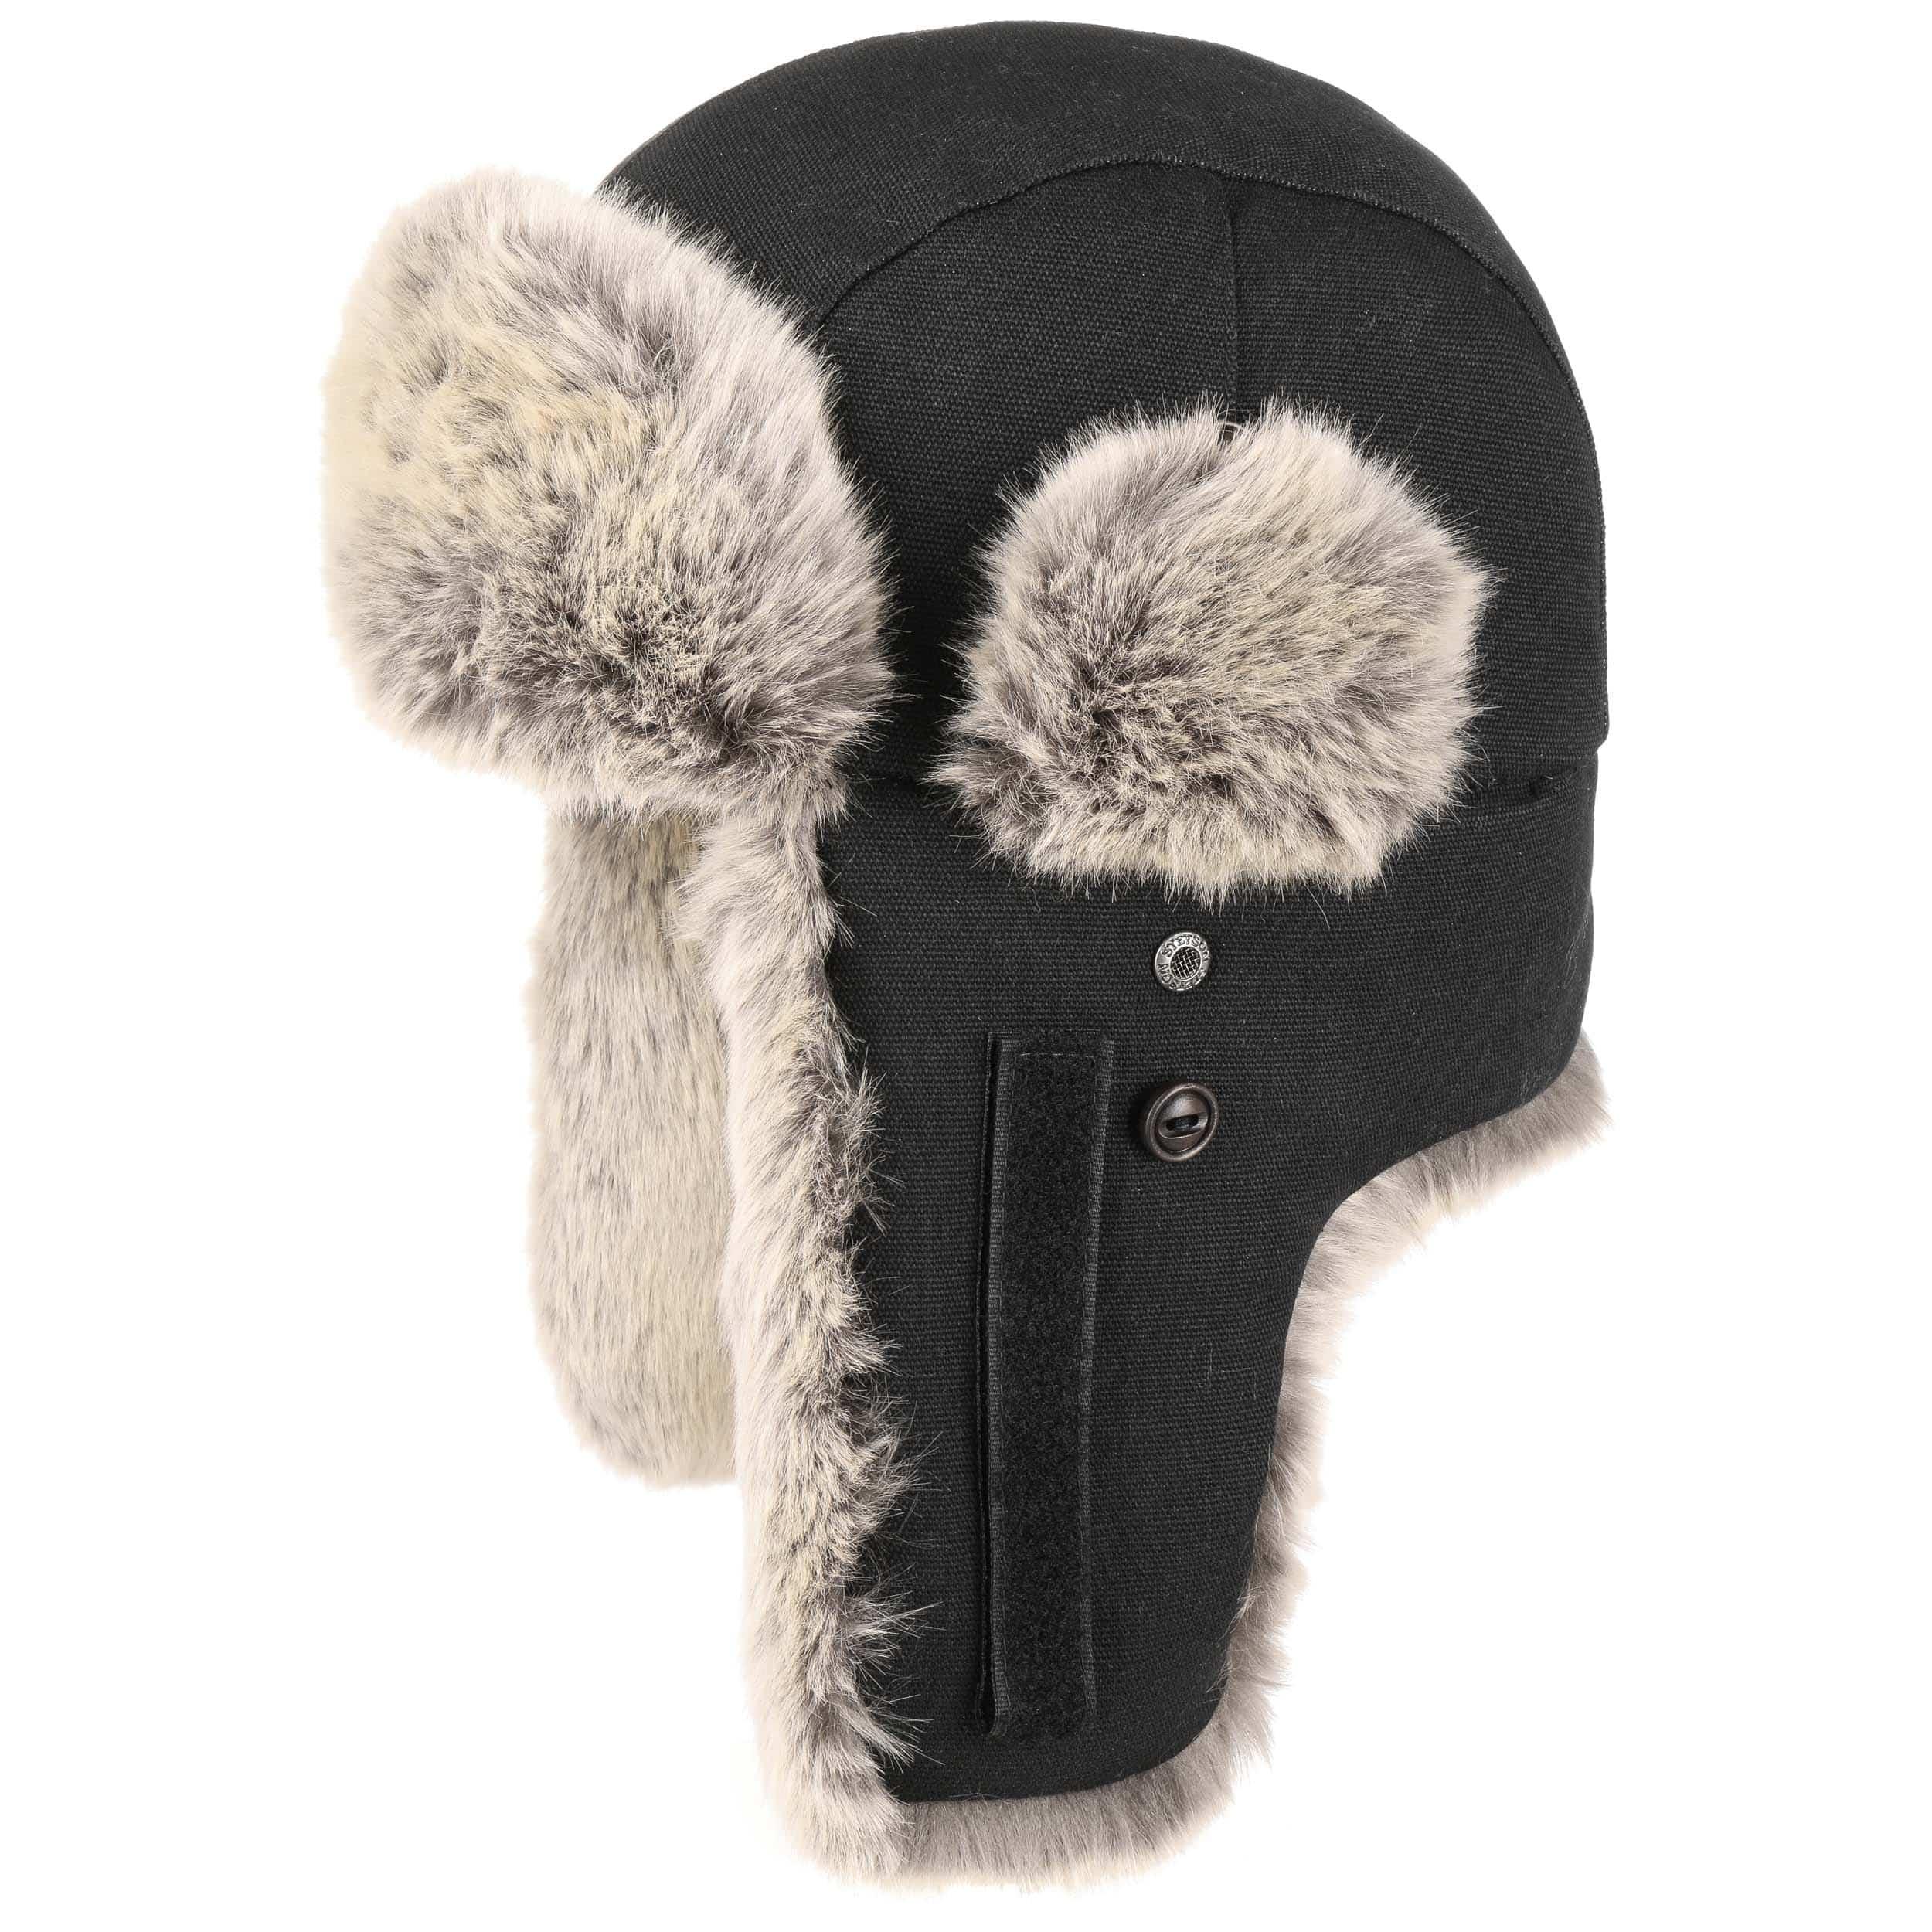 5e14995bf99f0 ... Hatfield Fake Fur Aviator Hat by Stetson - black 9